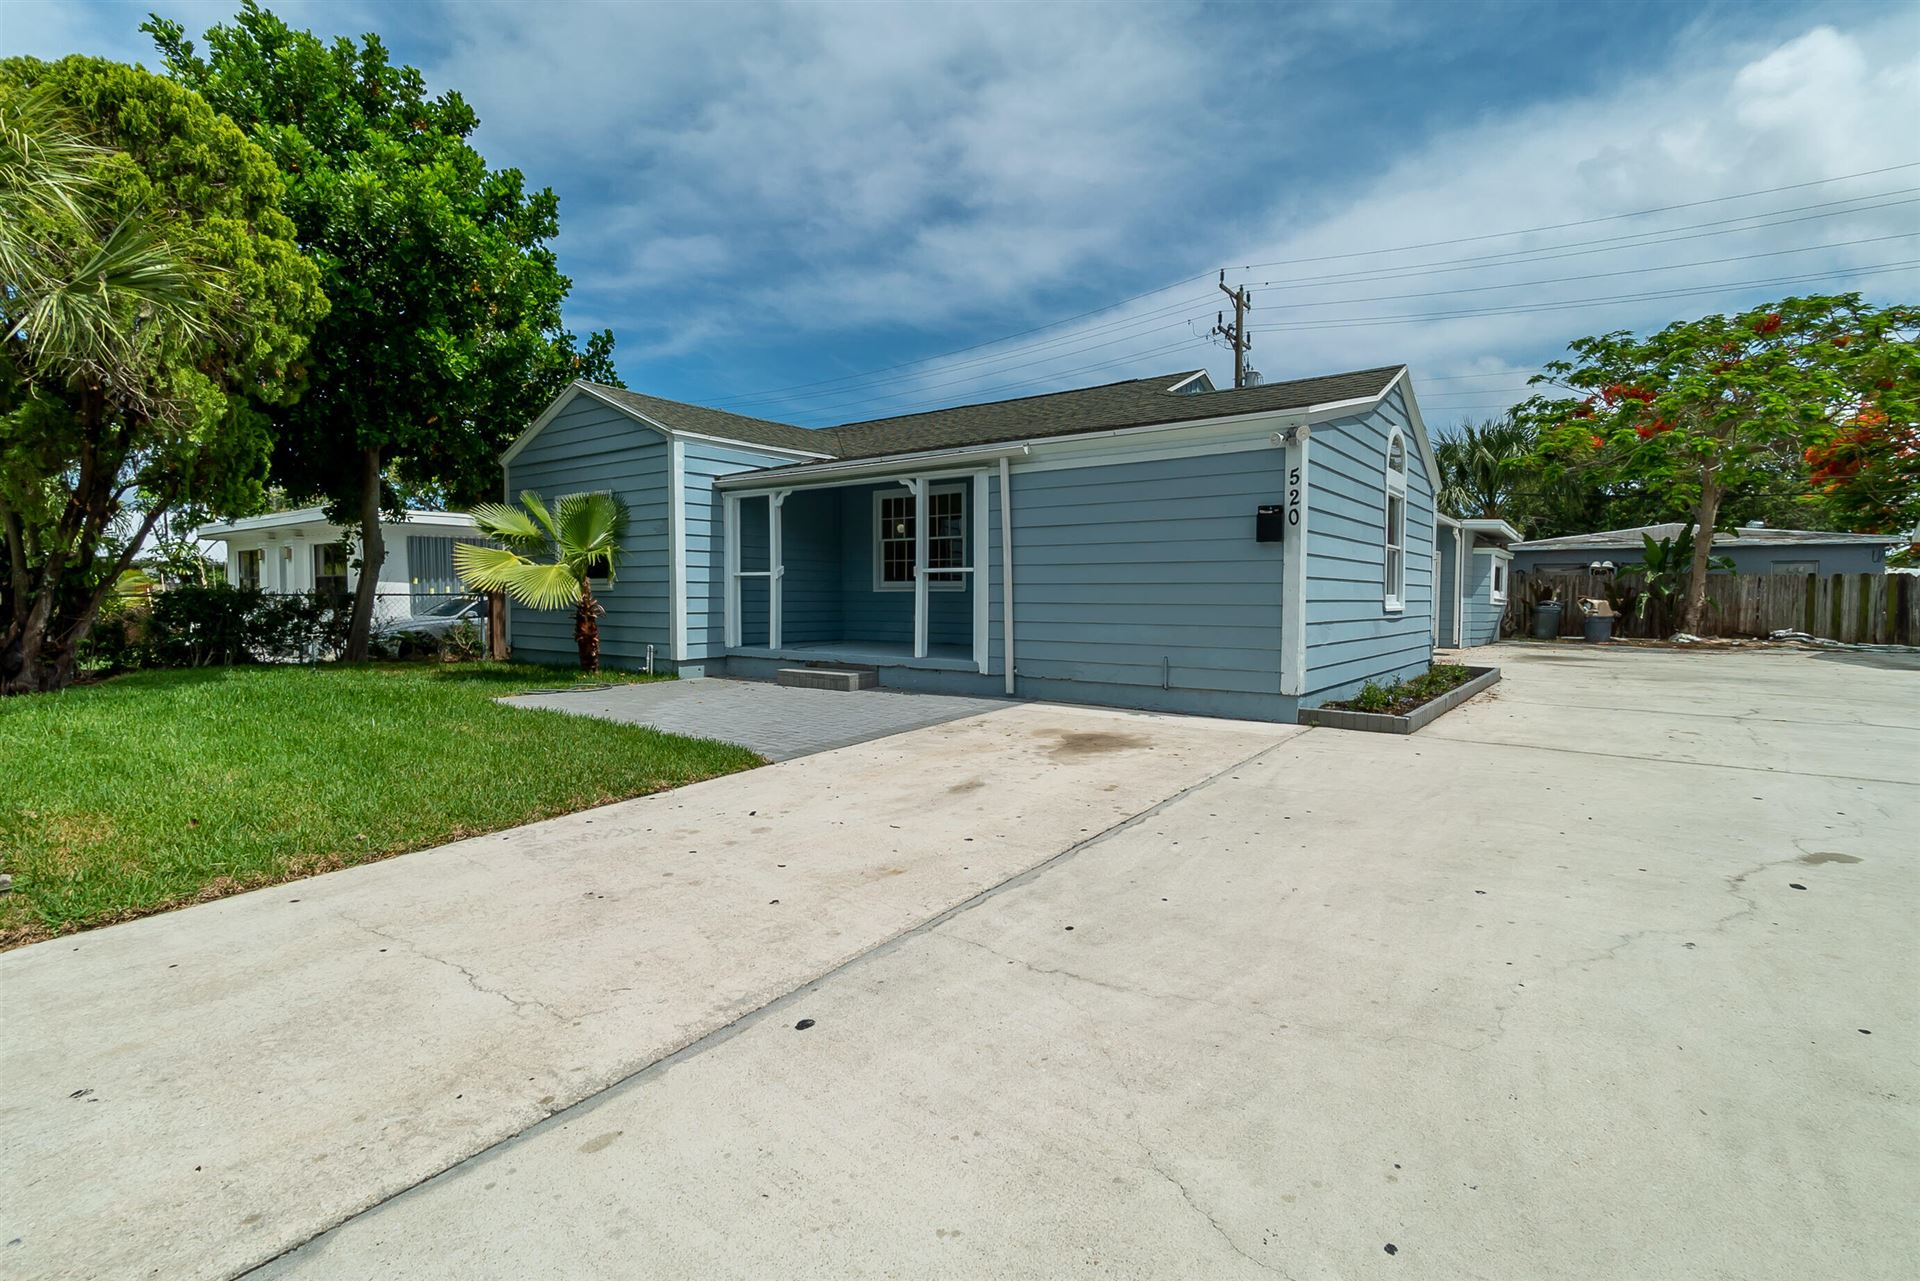 520 45th Street, West Palm Beach, FL 33407 - MLS#: RX-10723121